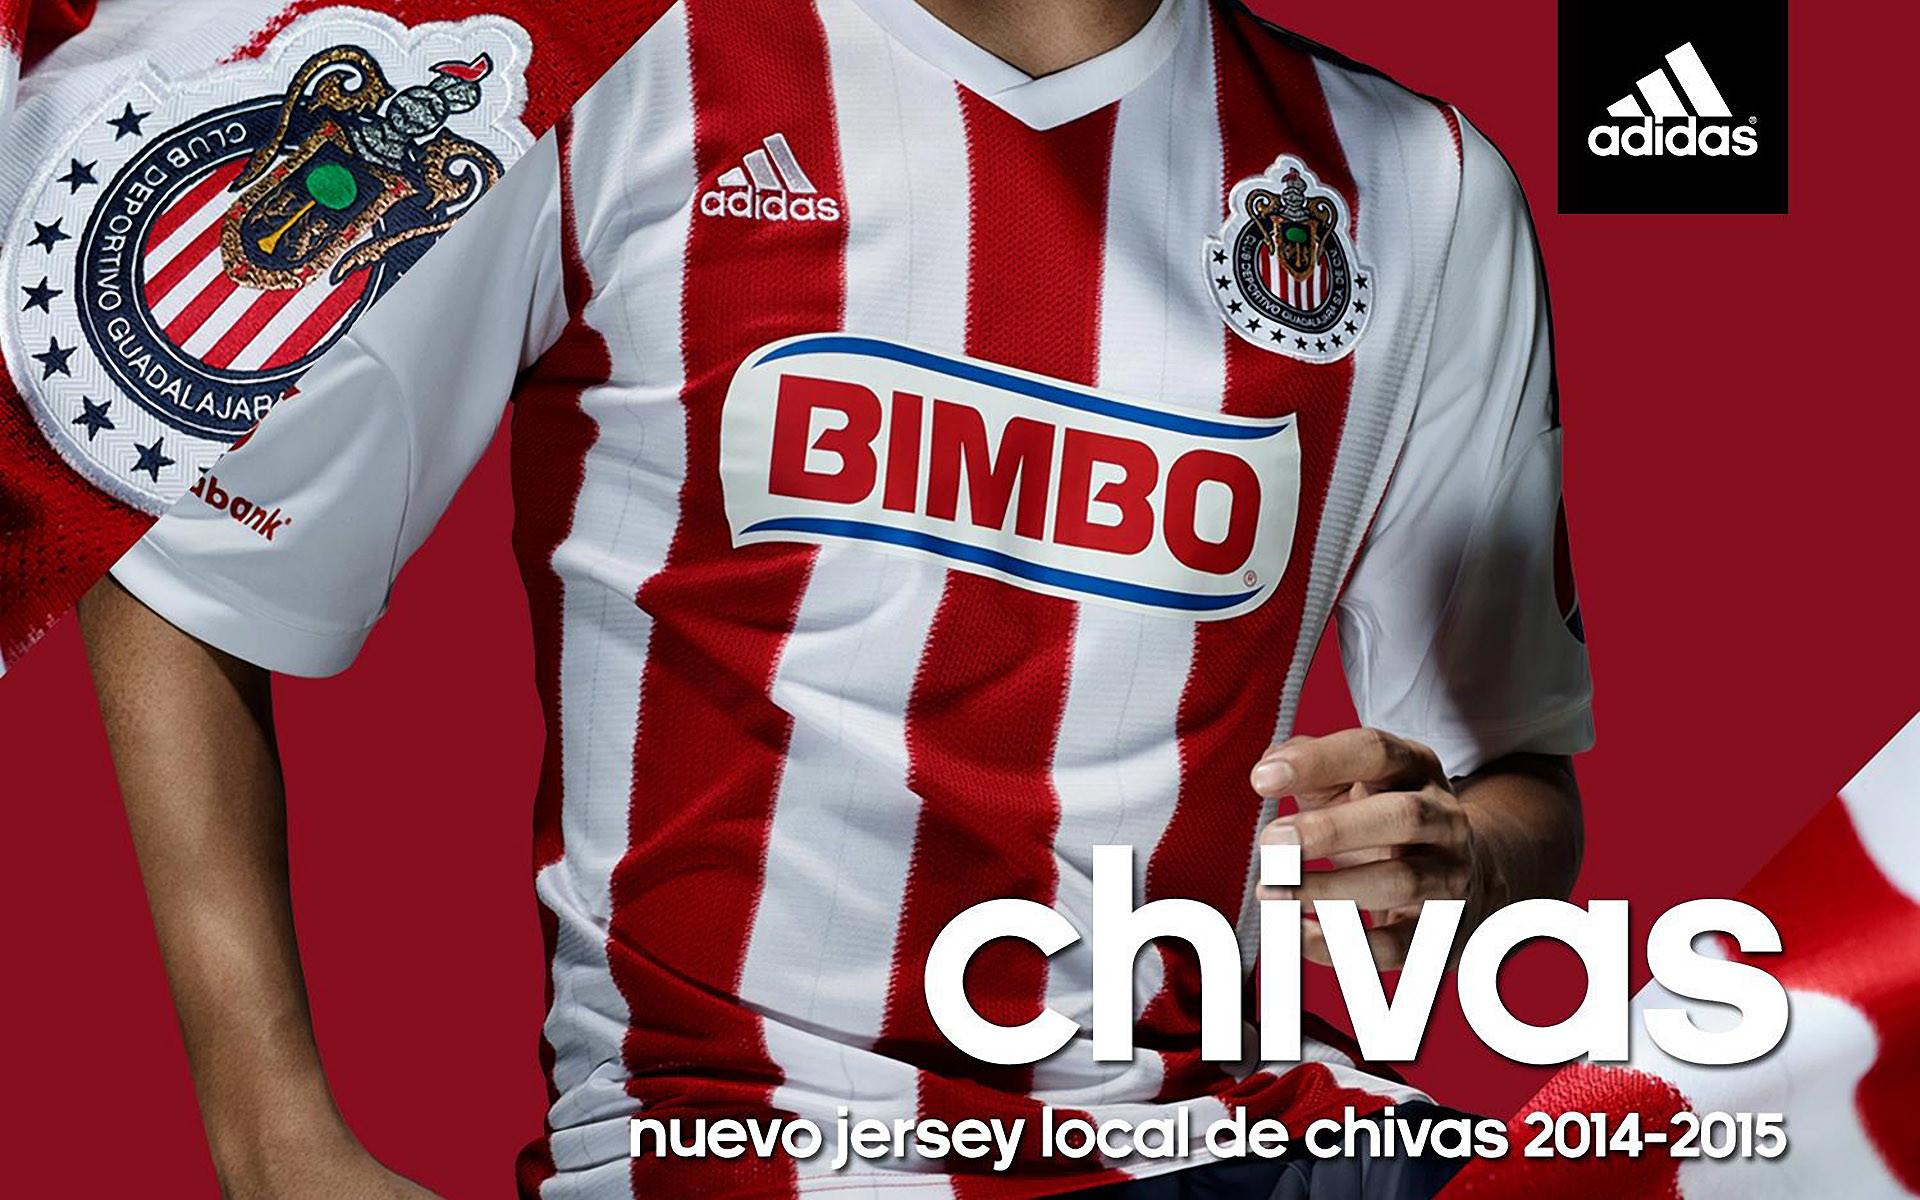 Chivas Guadalajara 2014-2015 Adidas Home Kit Jersey Wallpaper